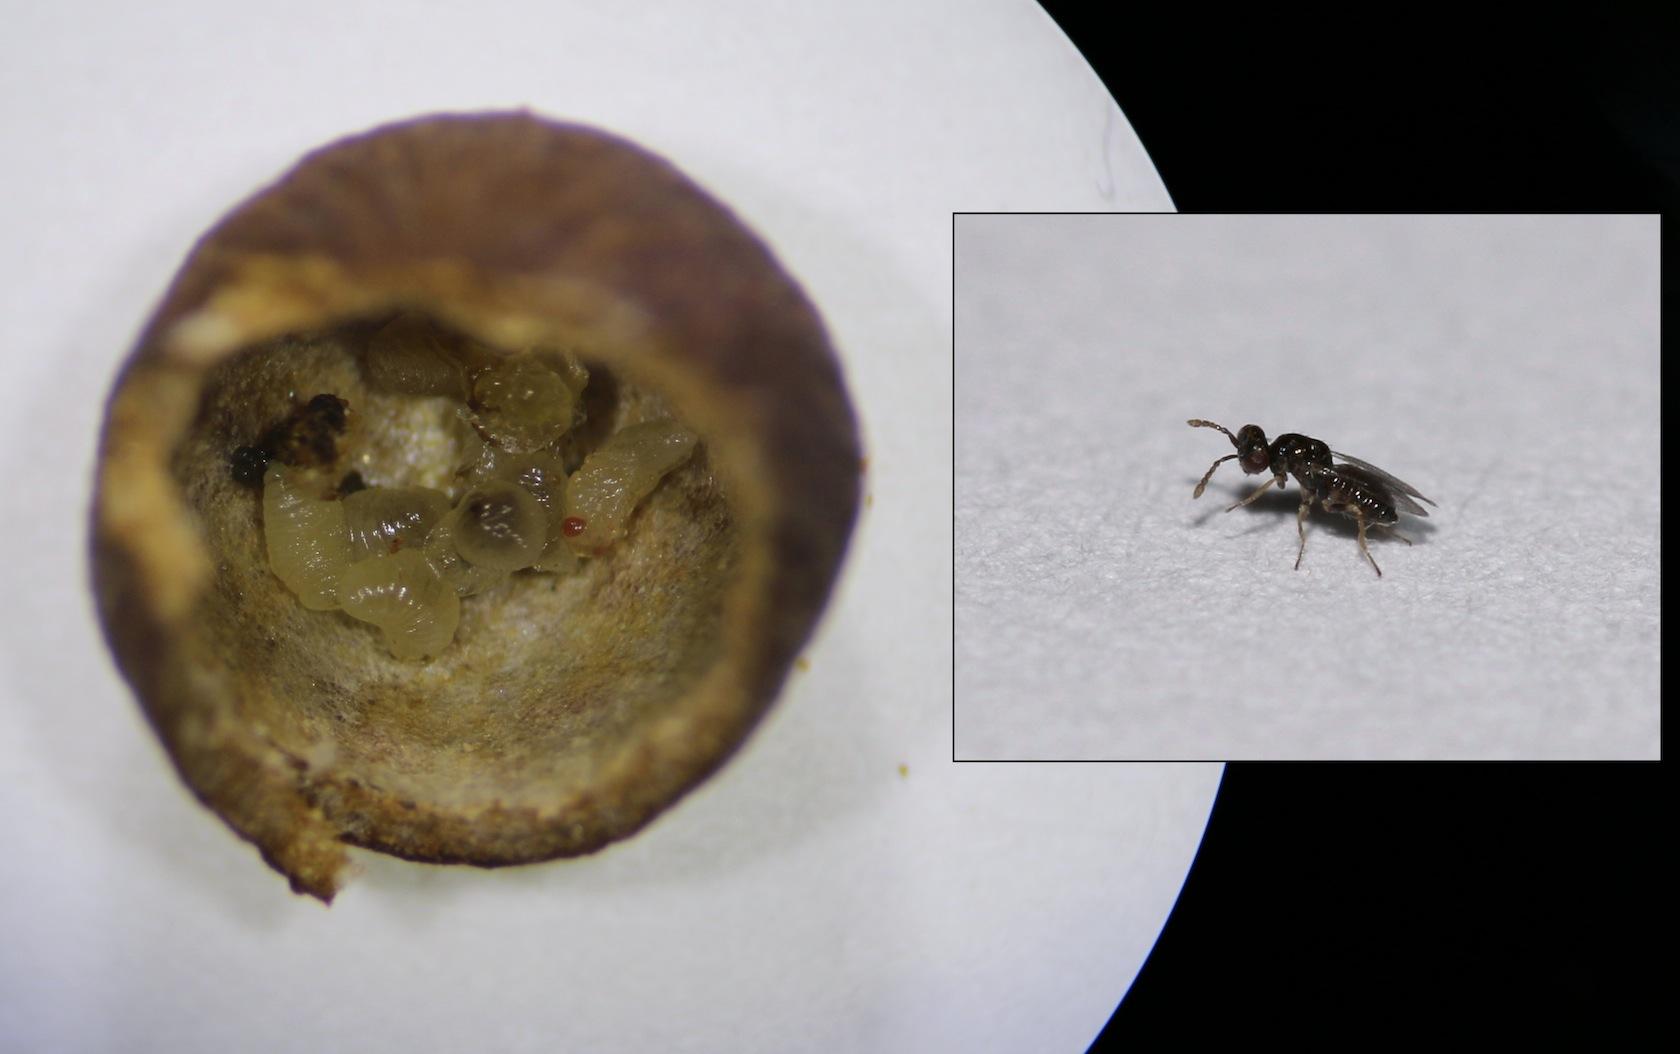 Stepanovia eurytomae